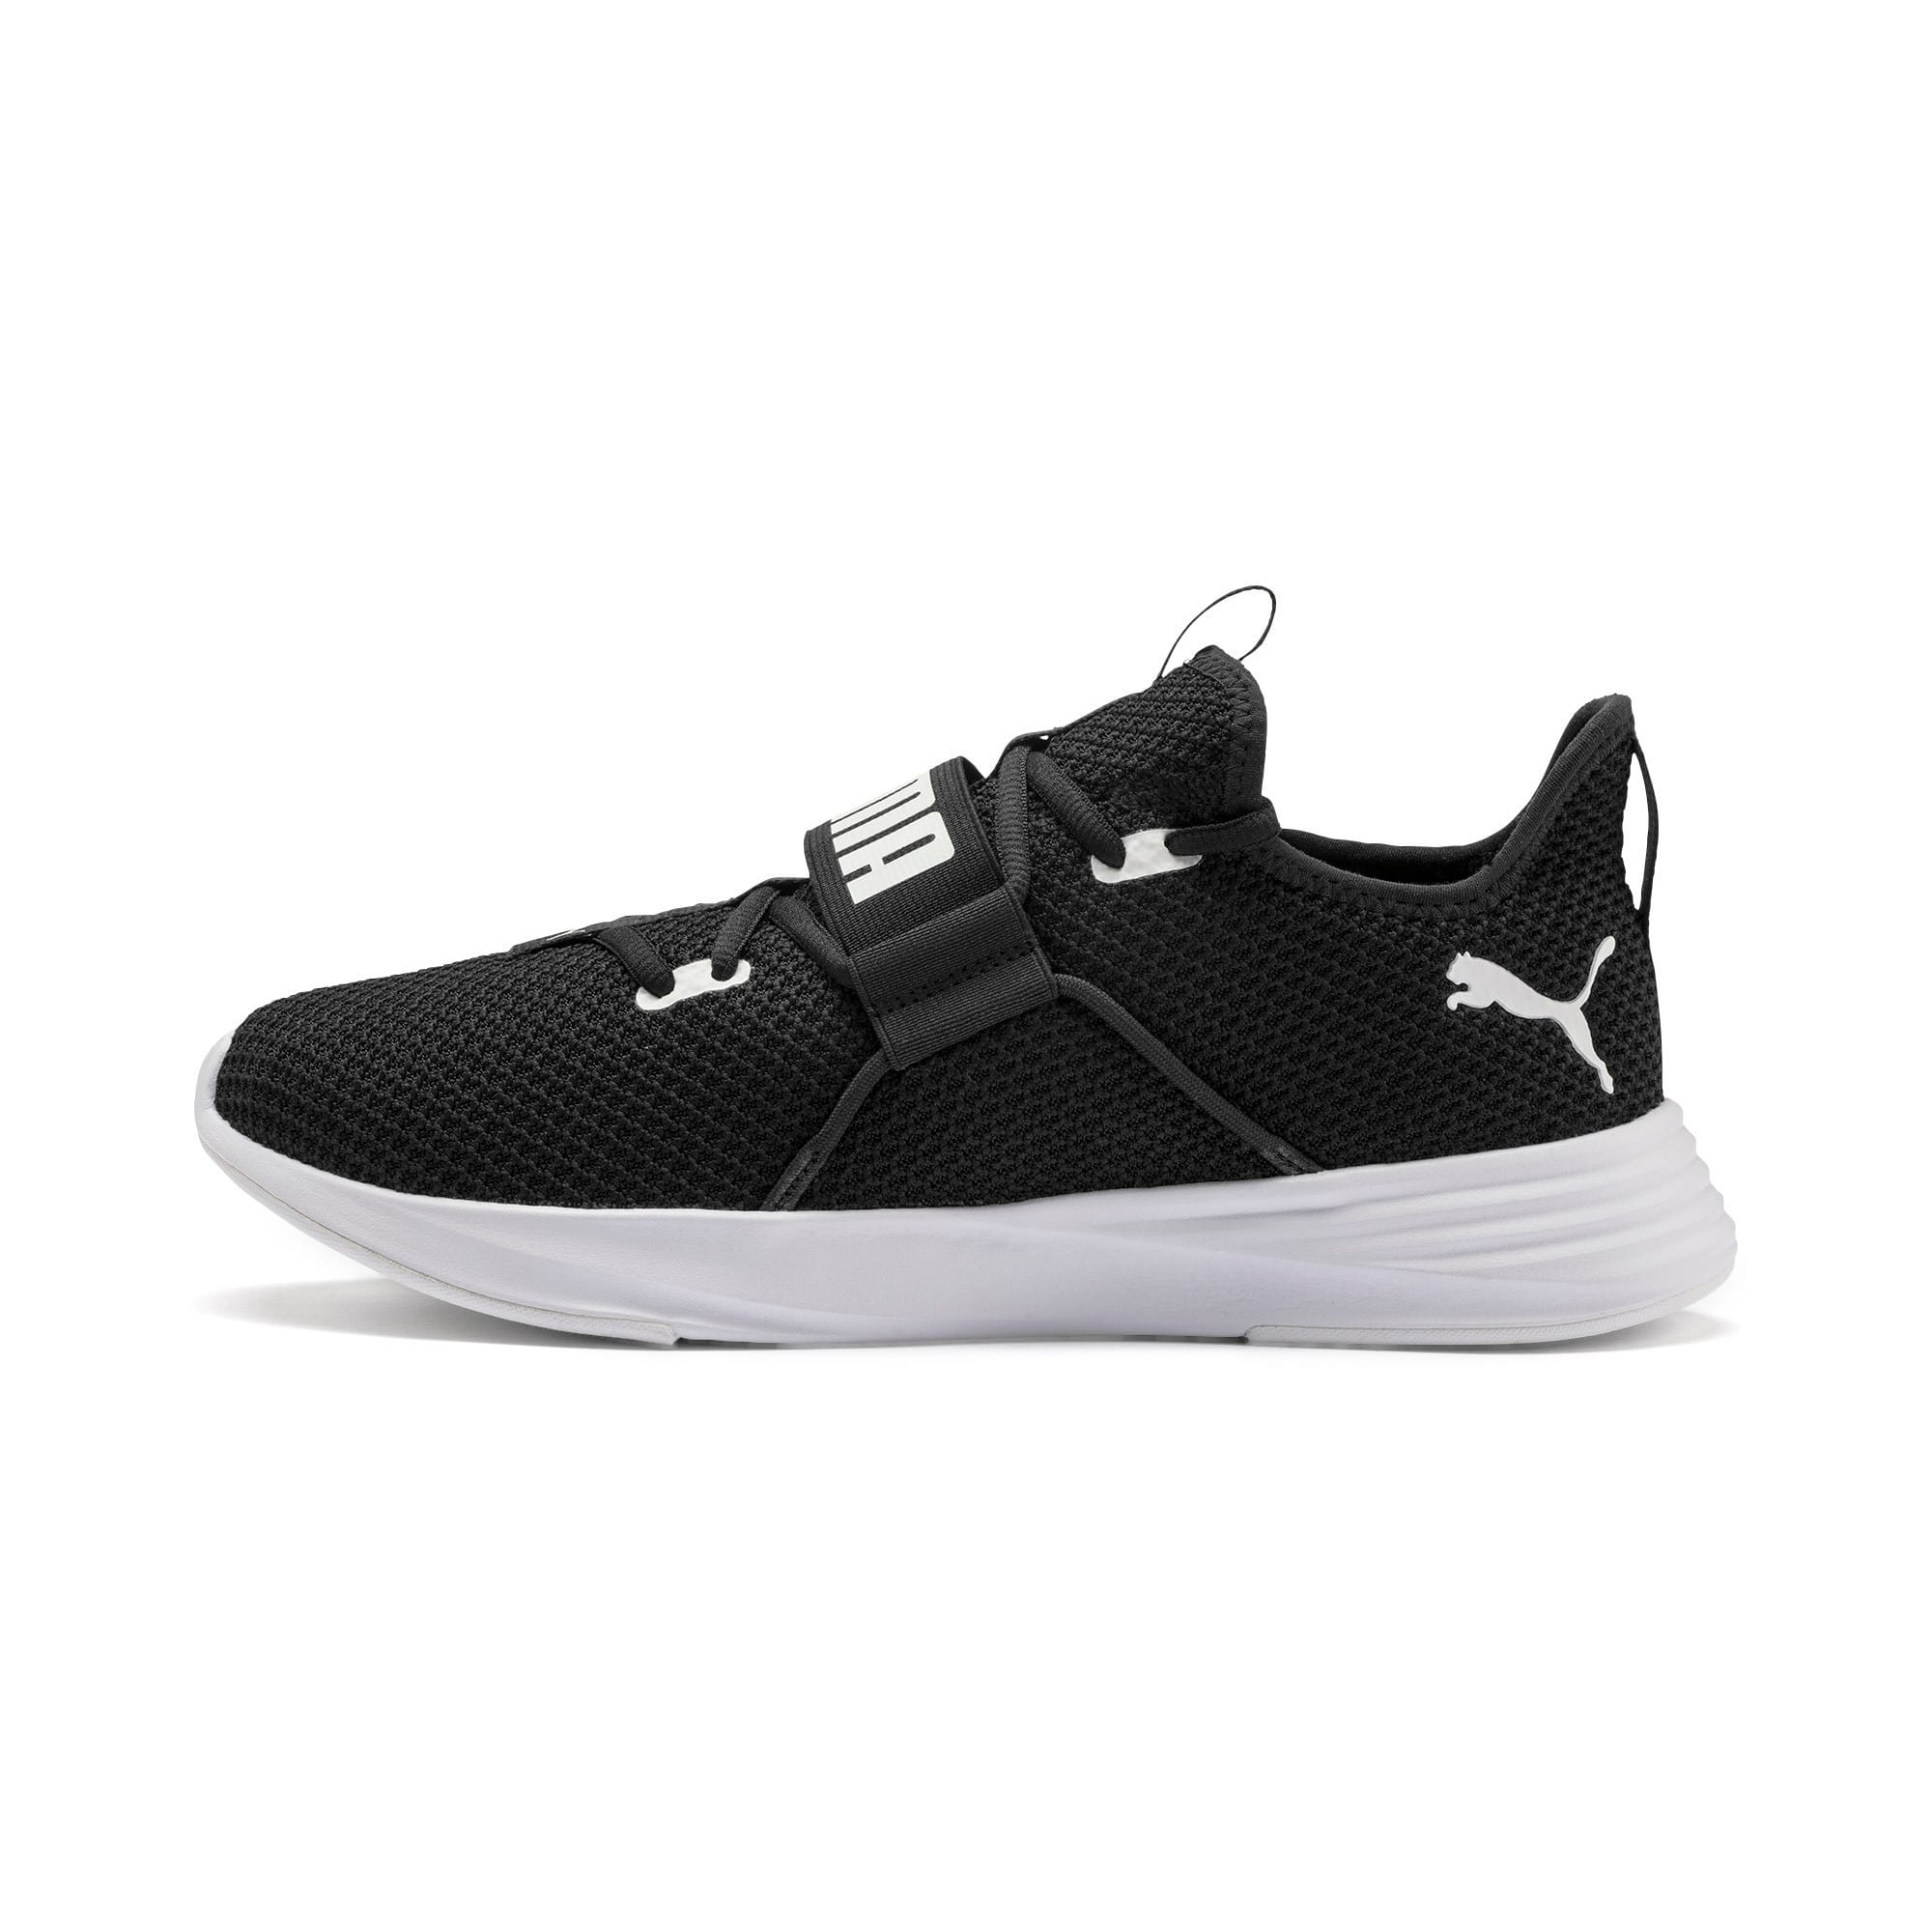 Thumbnail 1 of Persist XT Knit Men's Training Shoes, Puma Black-Puma White, medium